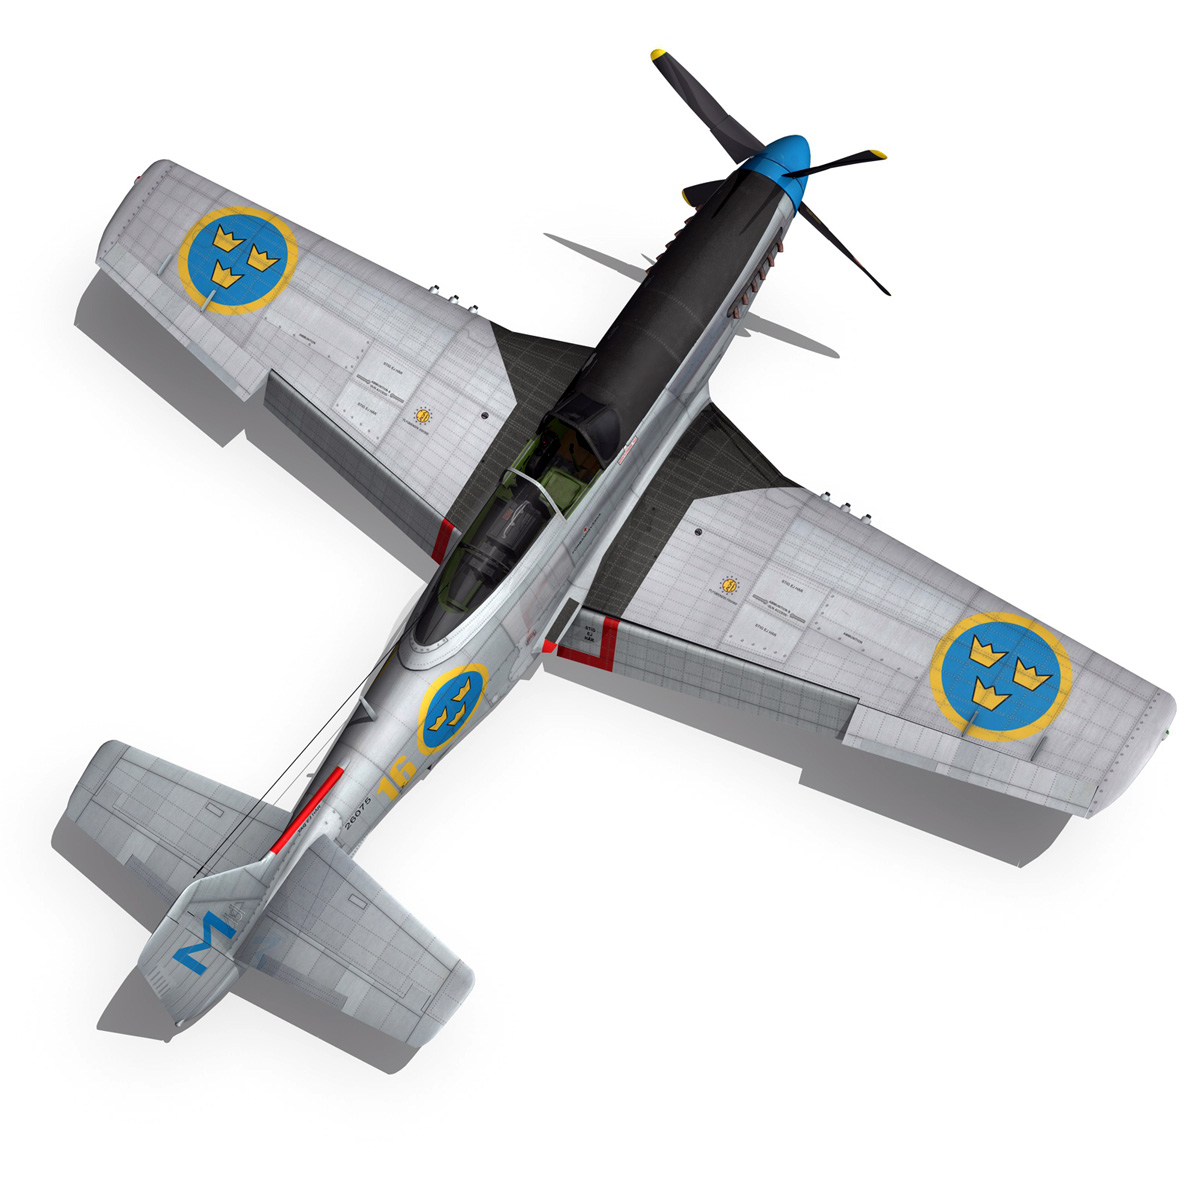 north american p-51d mustang – swedisch airforce 3d model fbx c4d lwo obj 268239